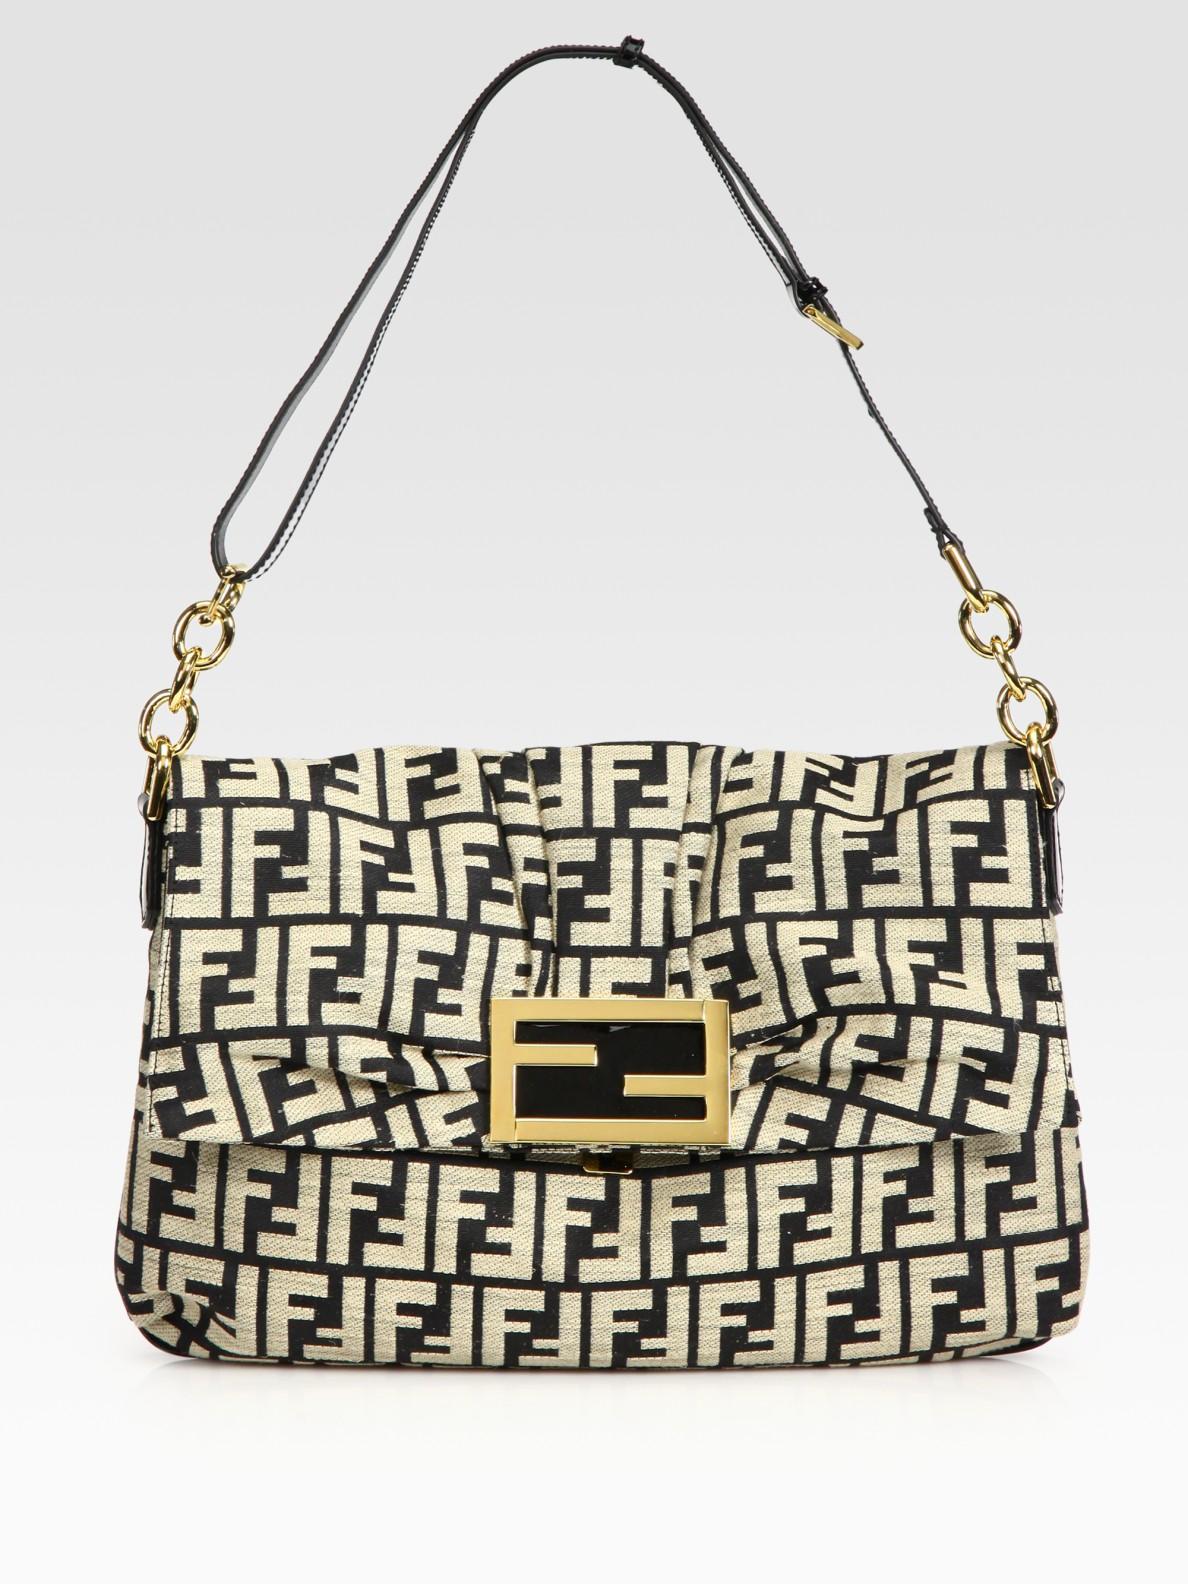 Fendi Borsa Mia Zucca Canvas Shoulder Bag 59